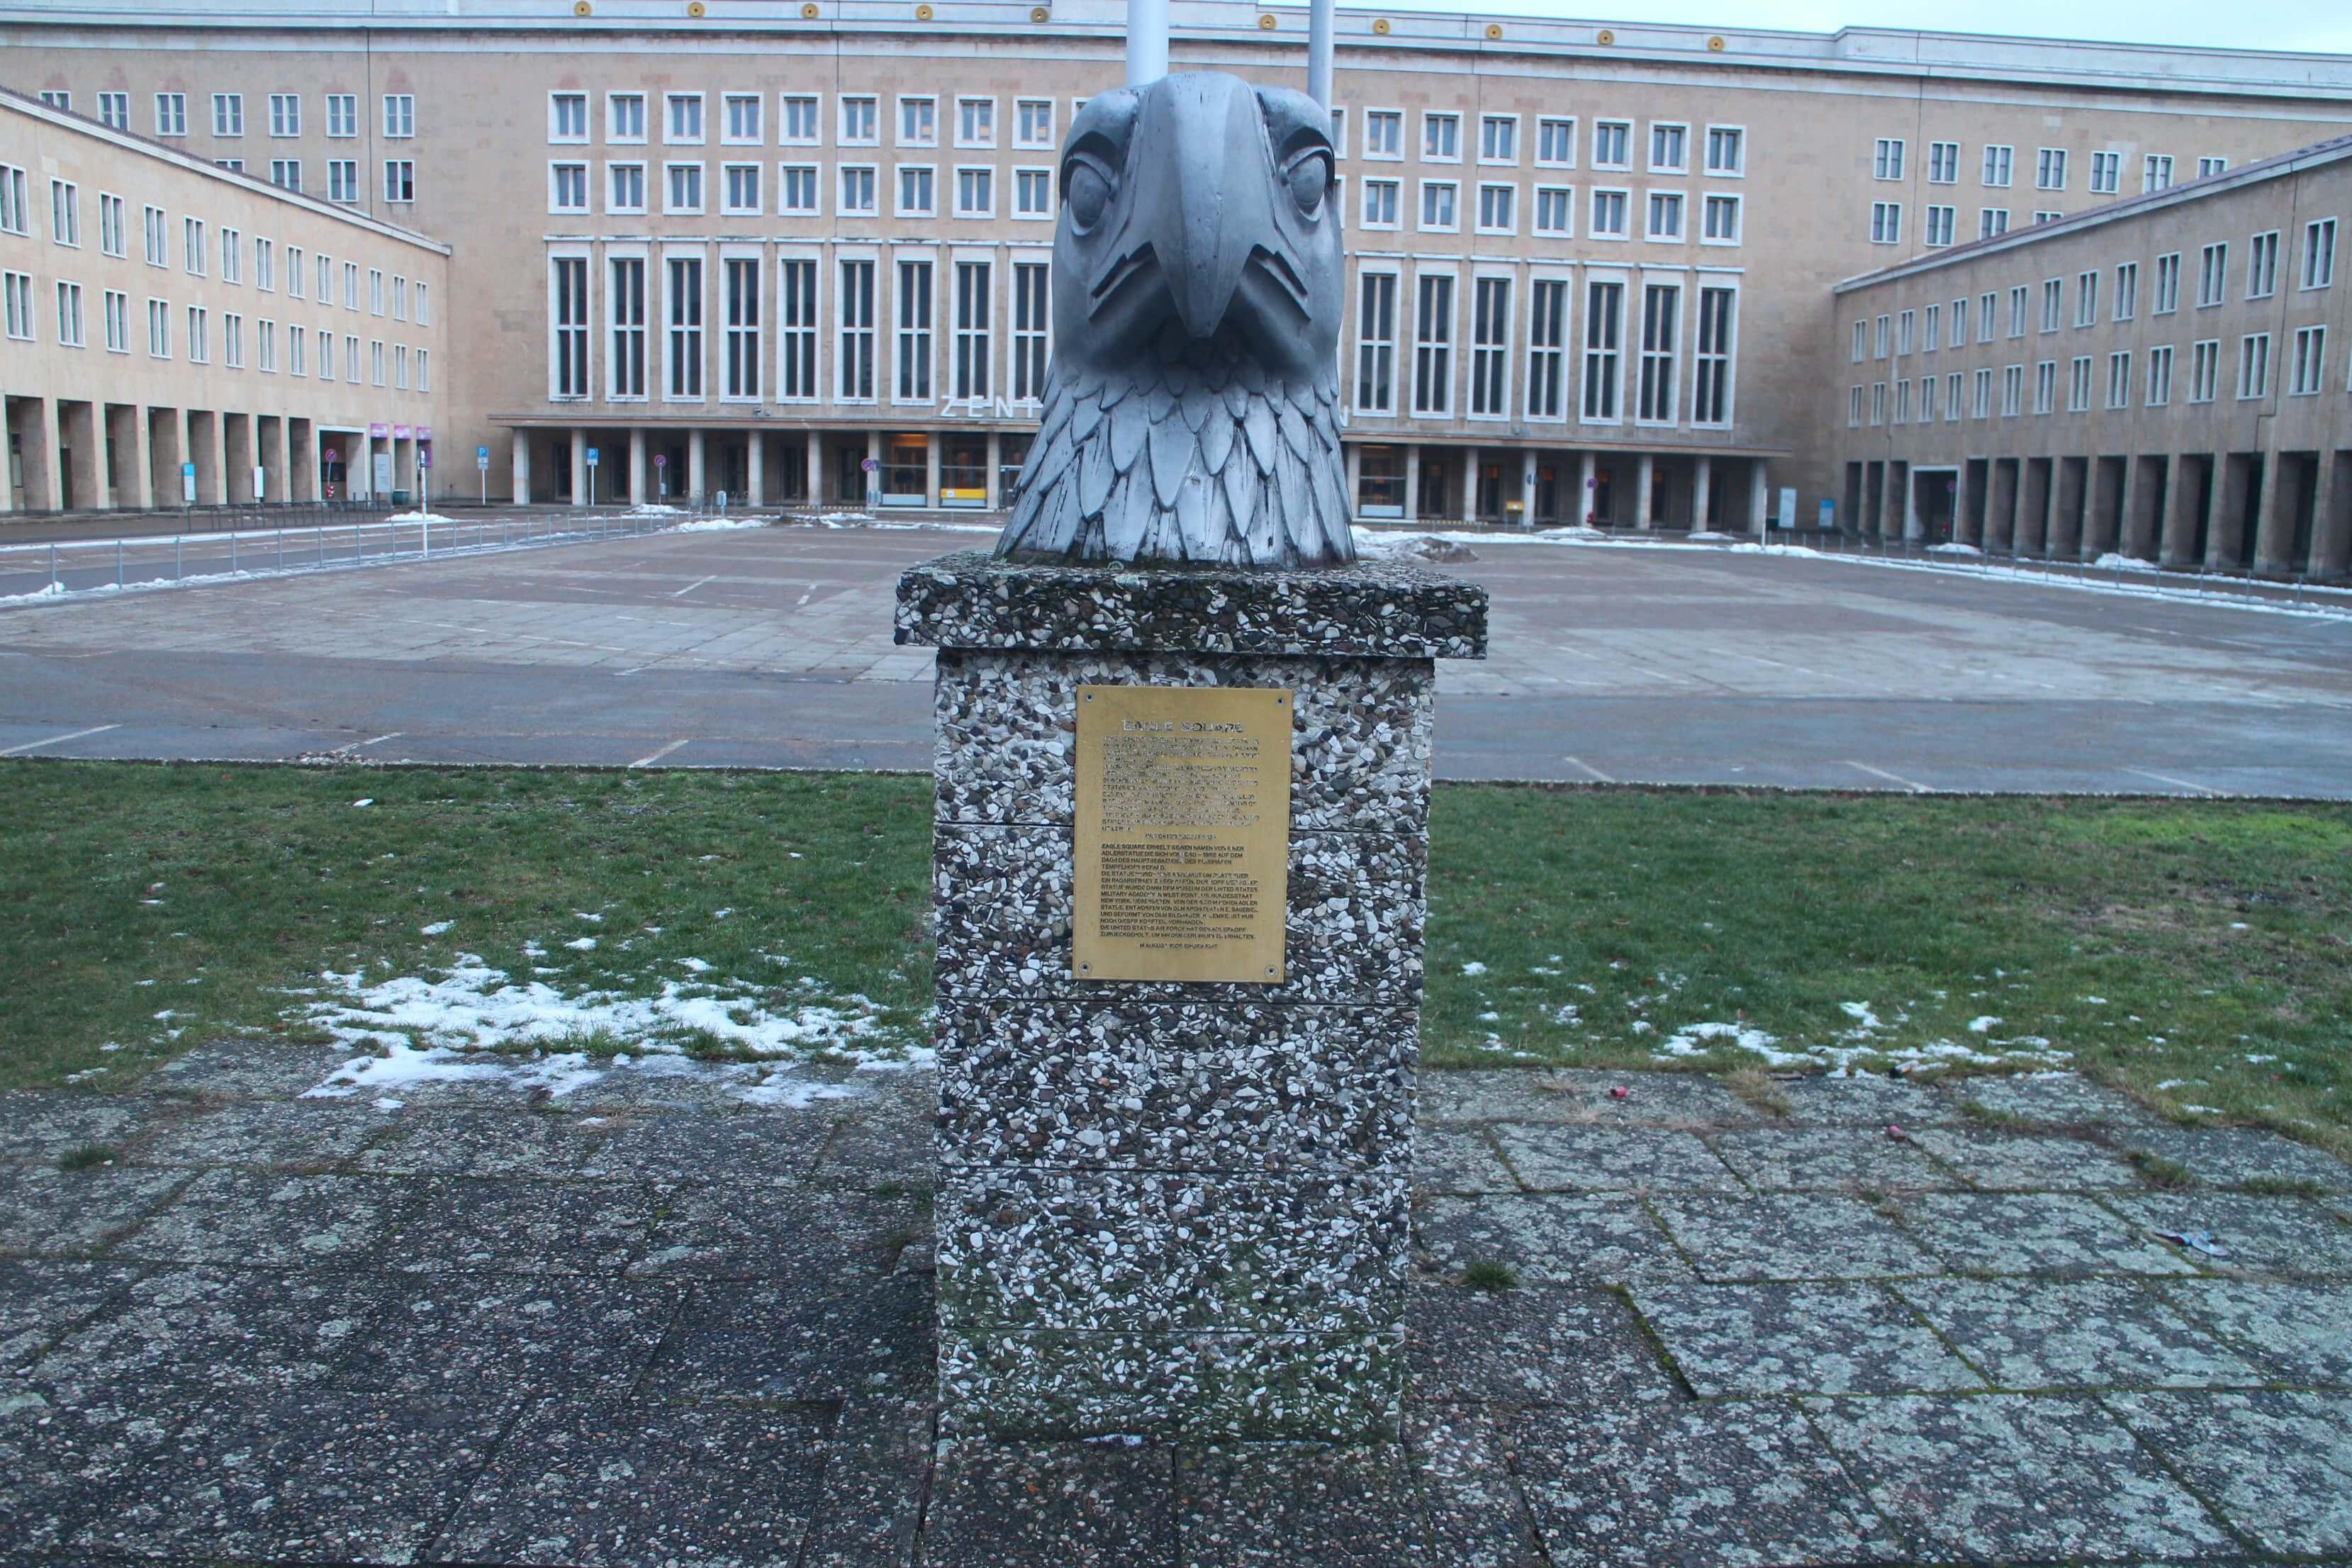 Luchthaven Berlijn Tempelhof